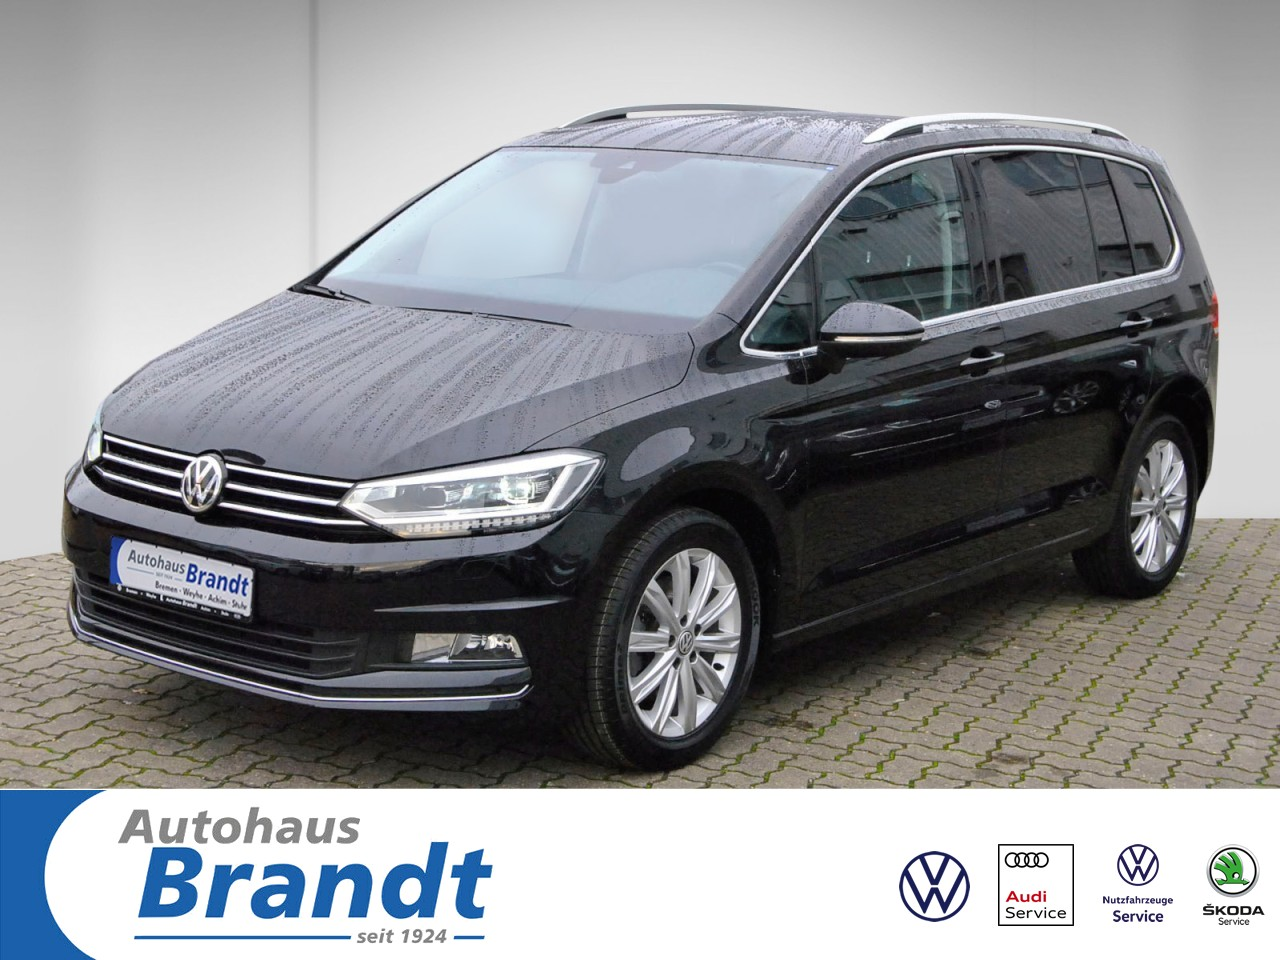 Volkswagen Touran 1.8 TSI Highline DSG NAVI*LED*PDC Klima, Jahr 2017, Benzin